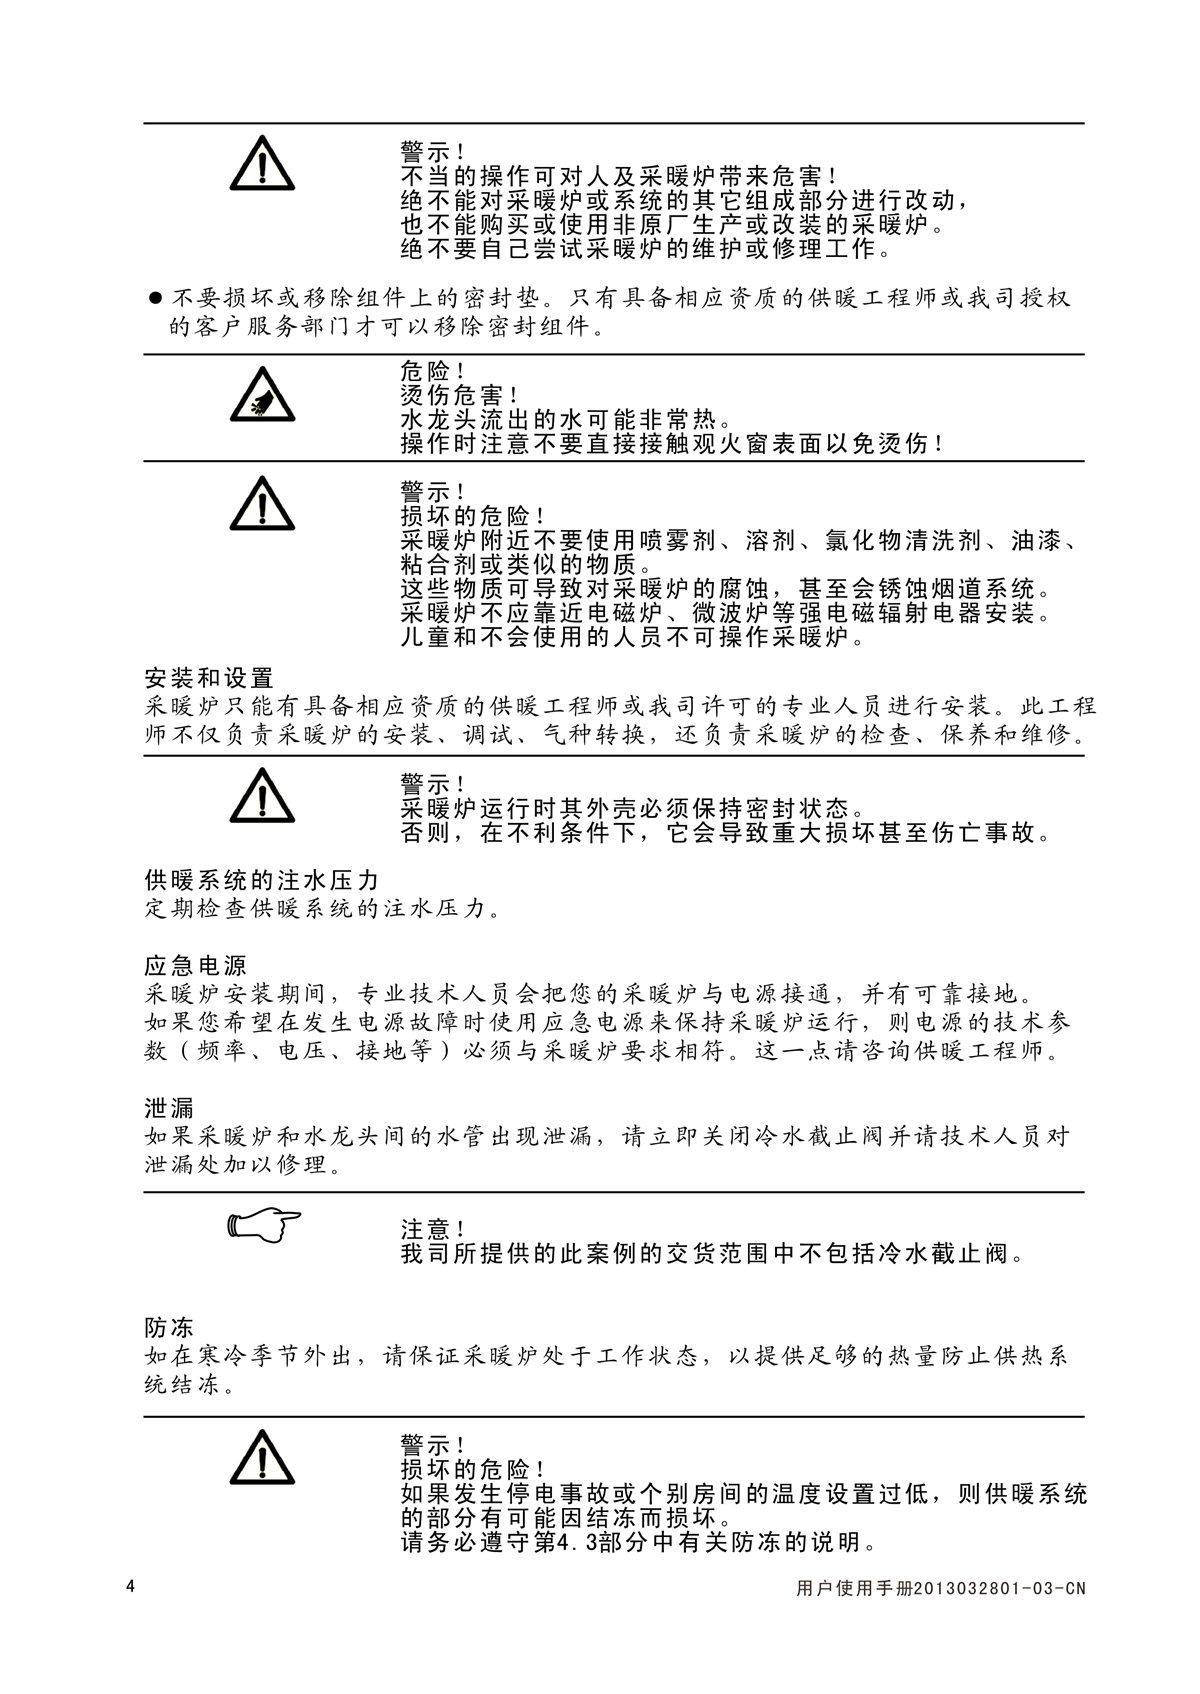 ES06系列-用户使用手册-5_01.jpg